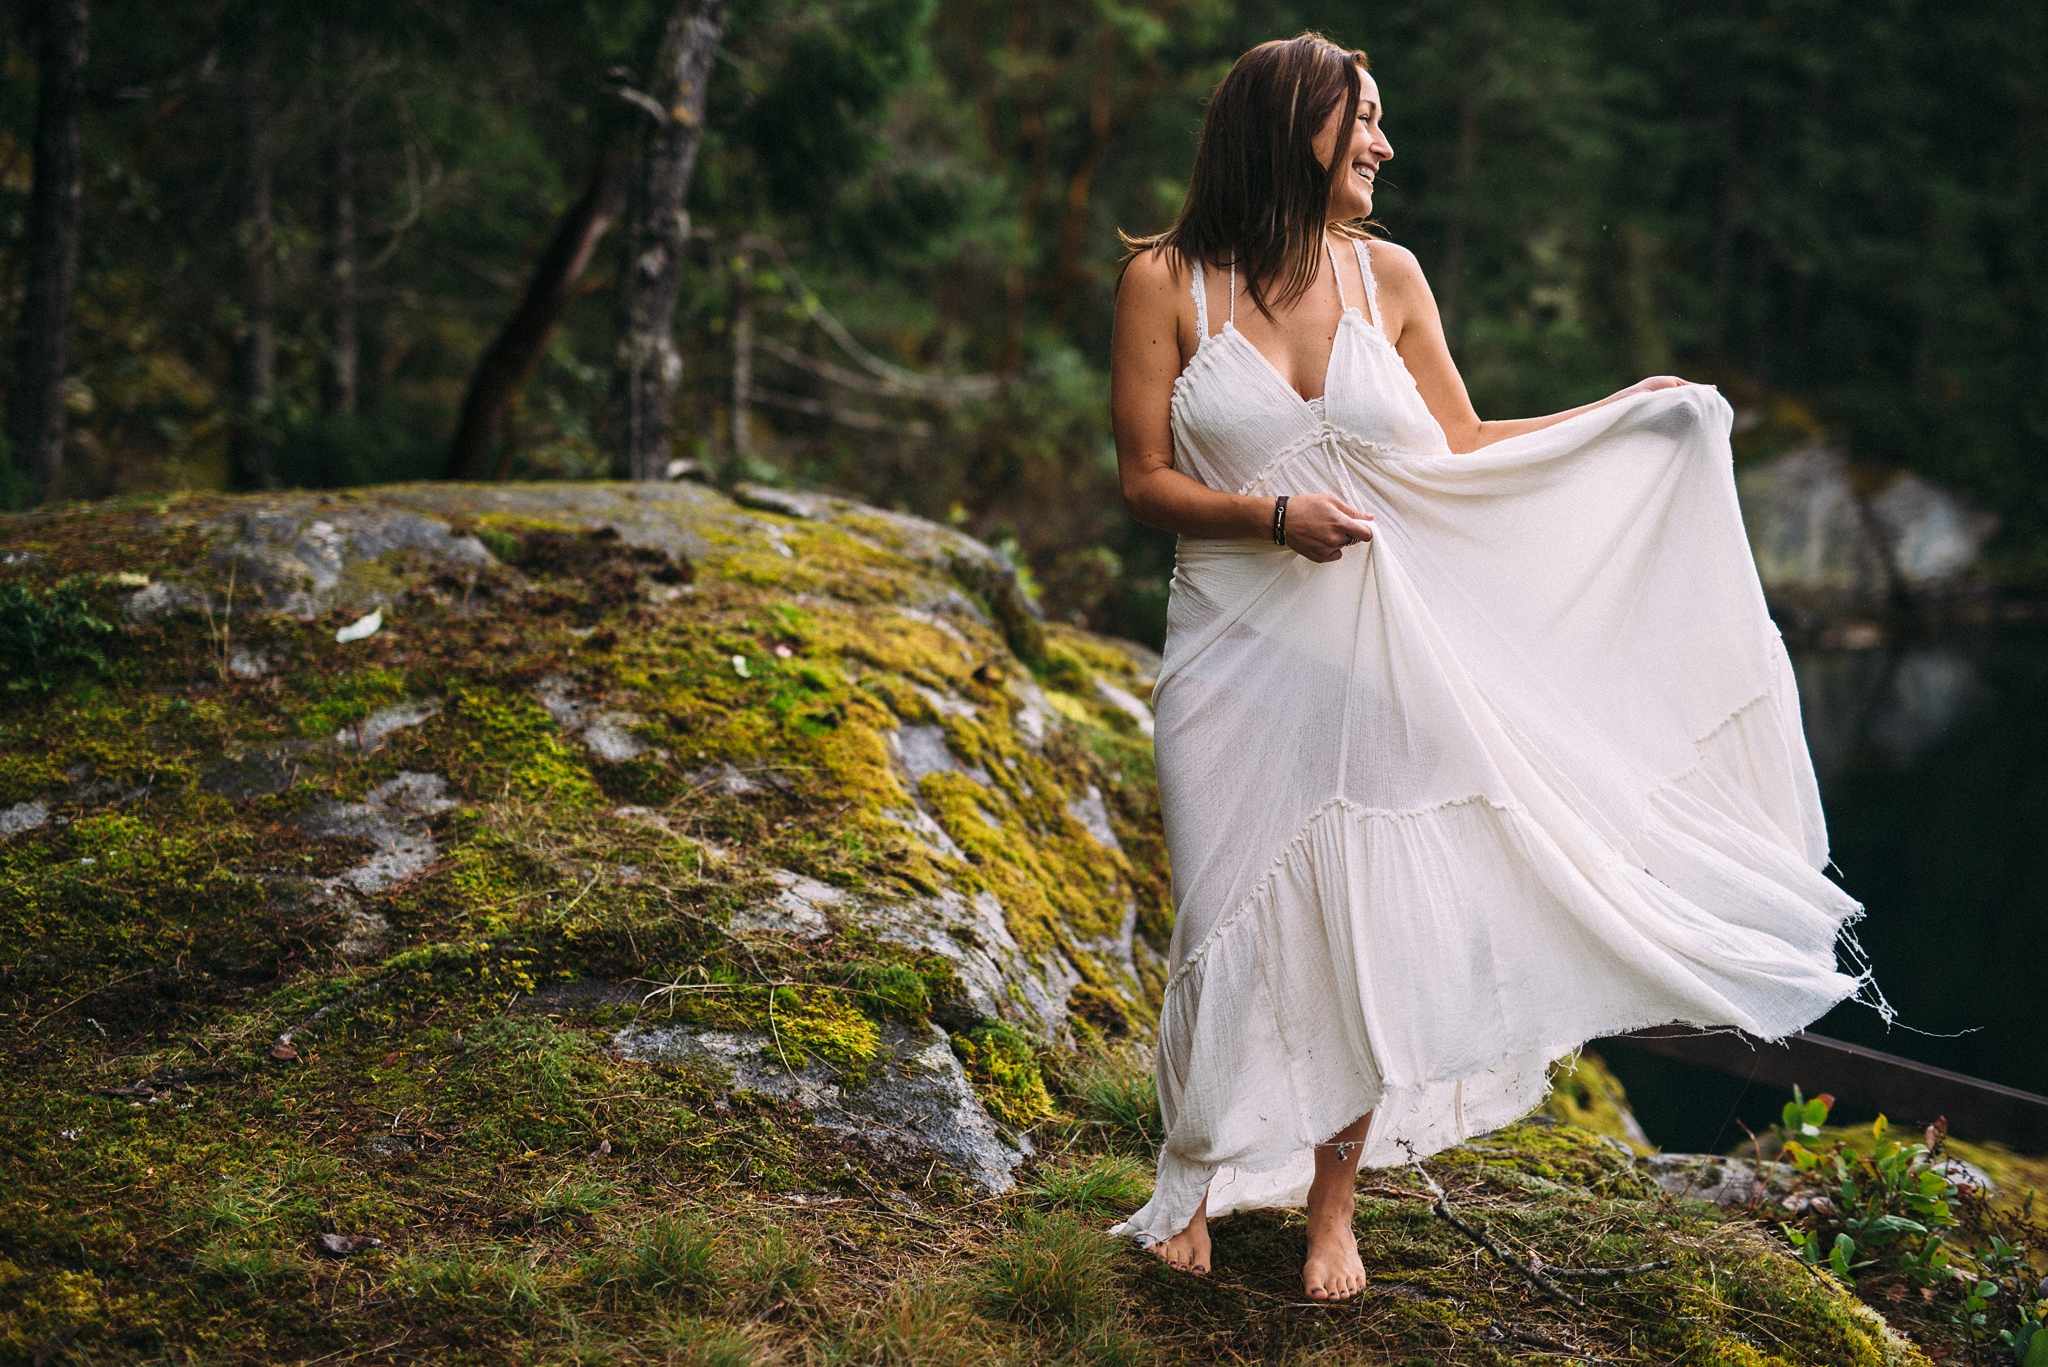 kaihla_tonai_intimate_wedding_elopement_photographer_3386